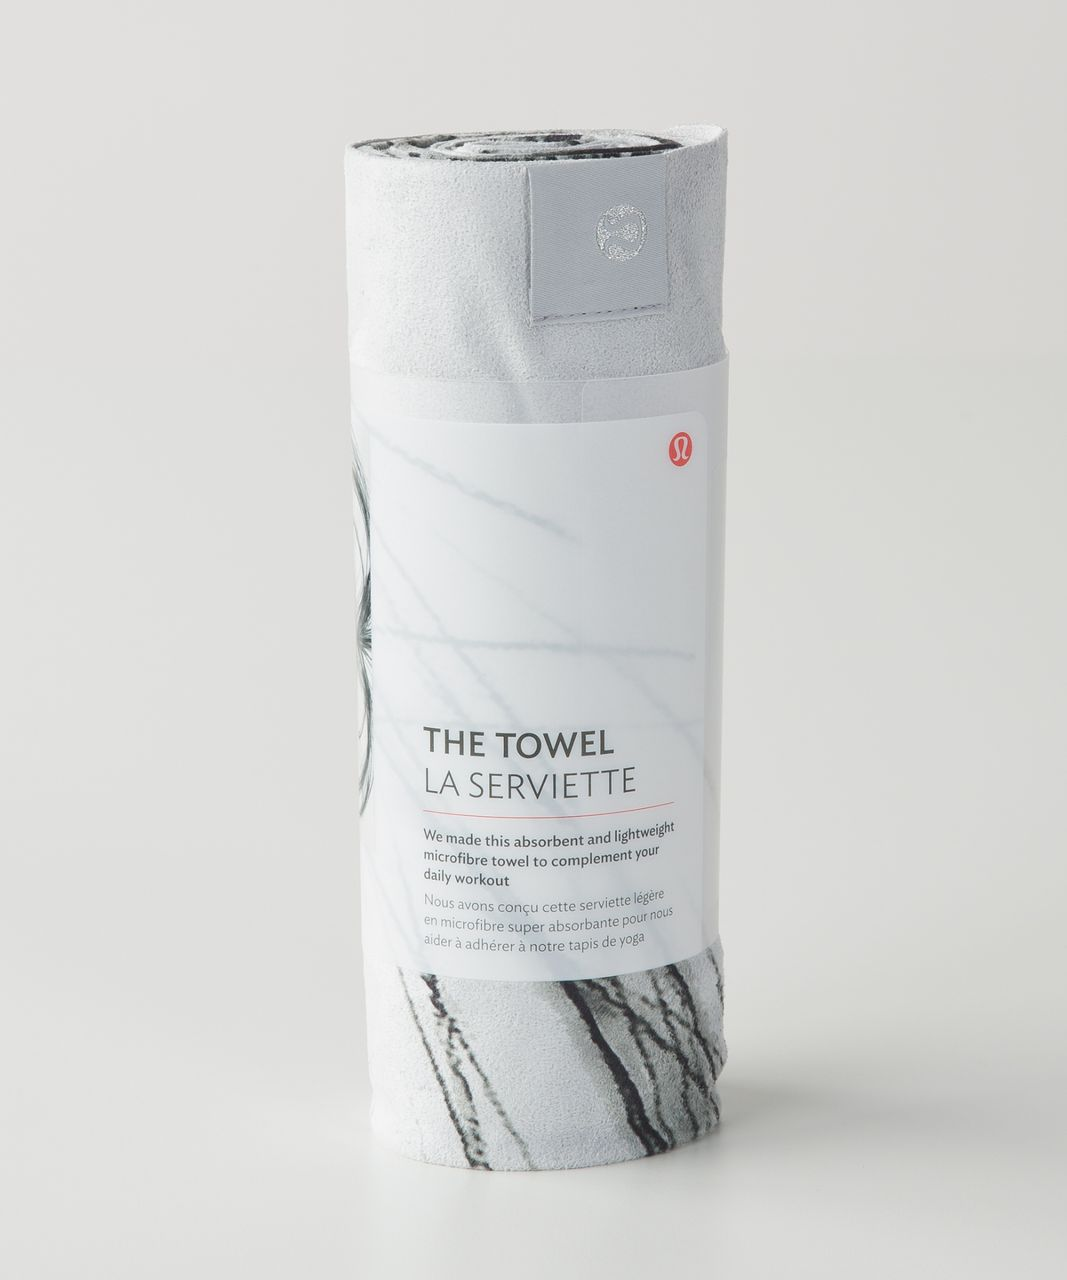 Lululemon The Towel - Heather Hansen Towel Silver Spoon Black